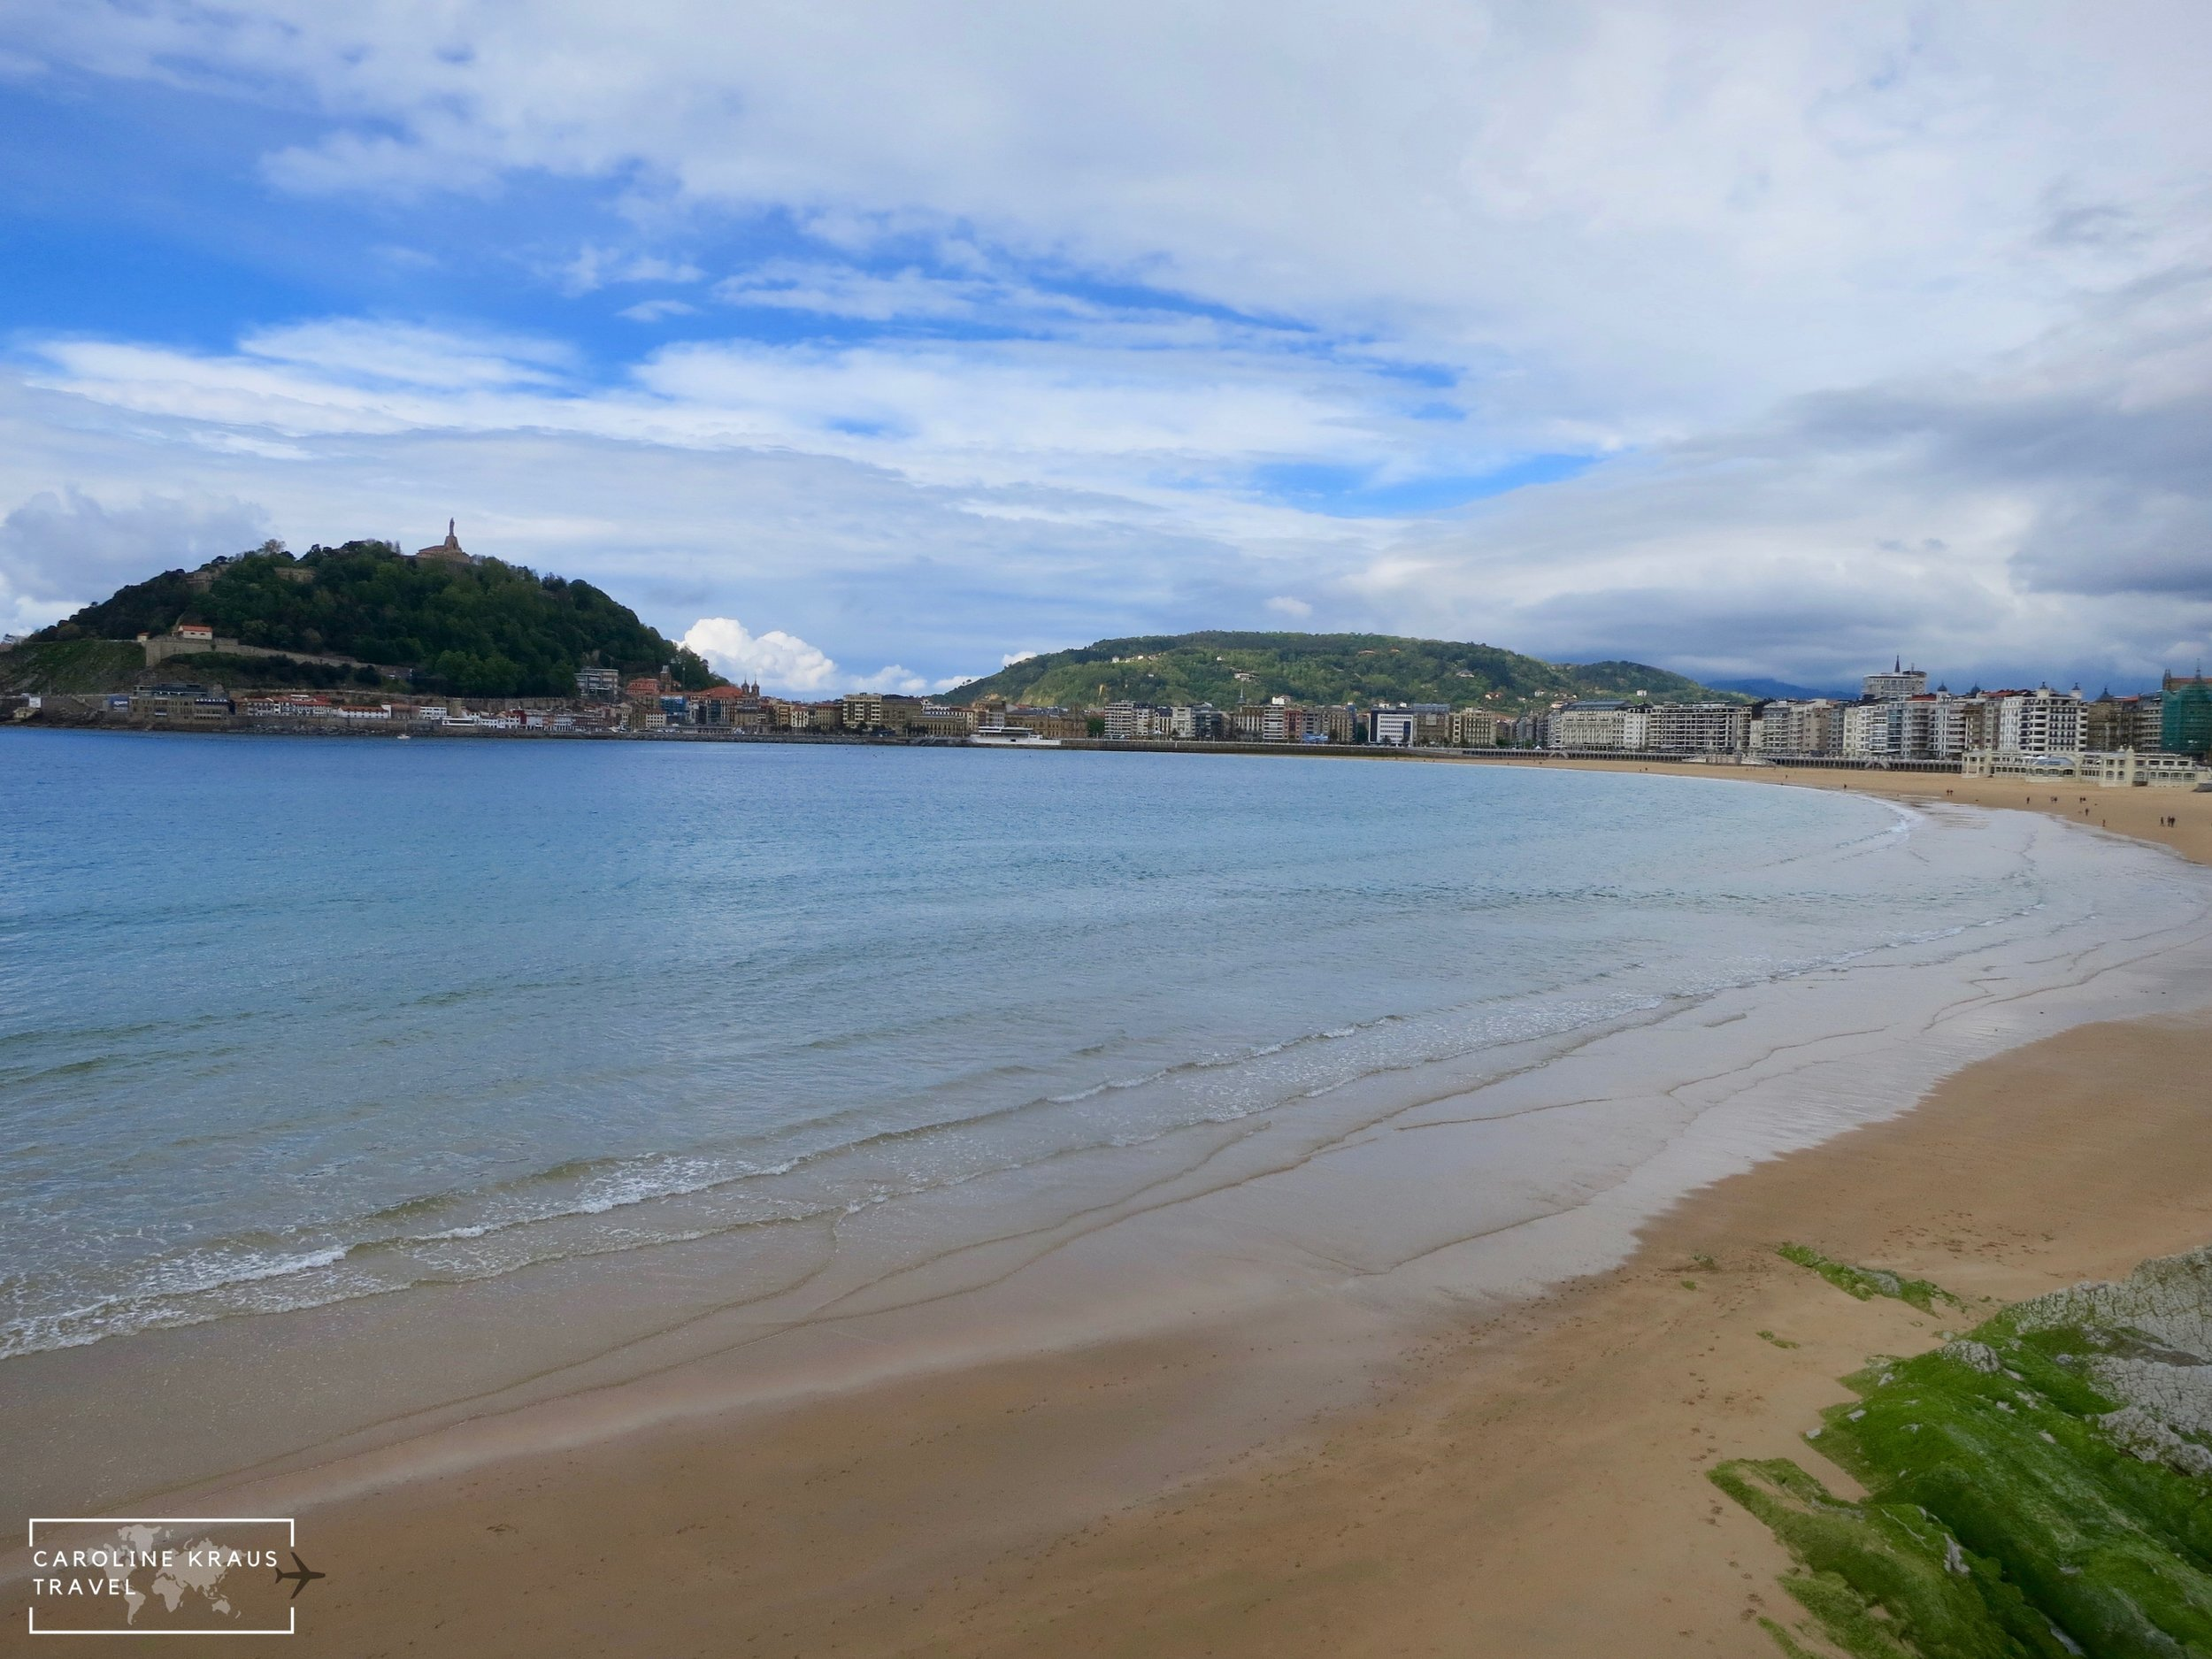 Why San Sebastian, Spain Should Be on Every Foodie's Travel Bucket List